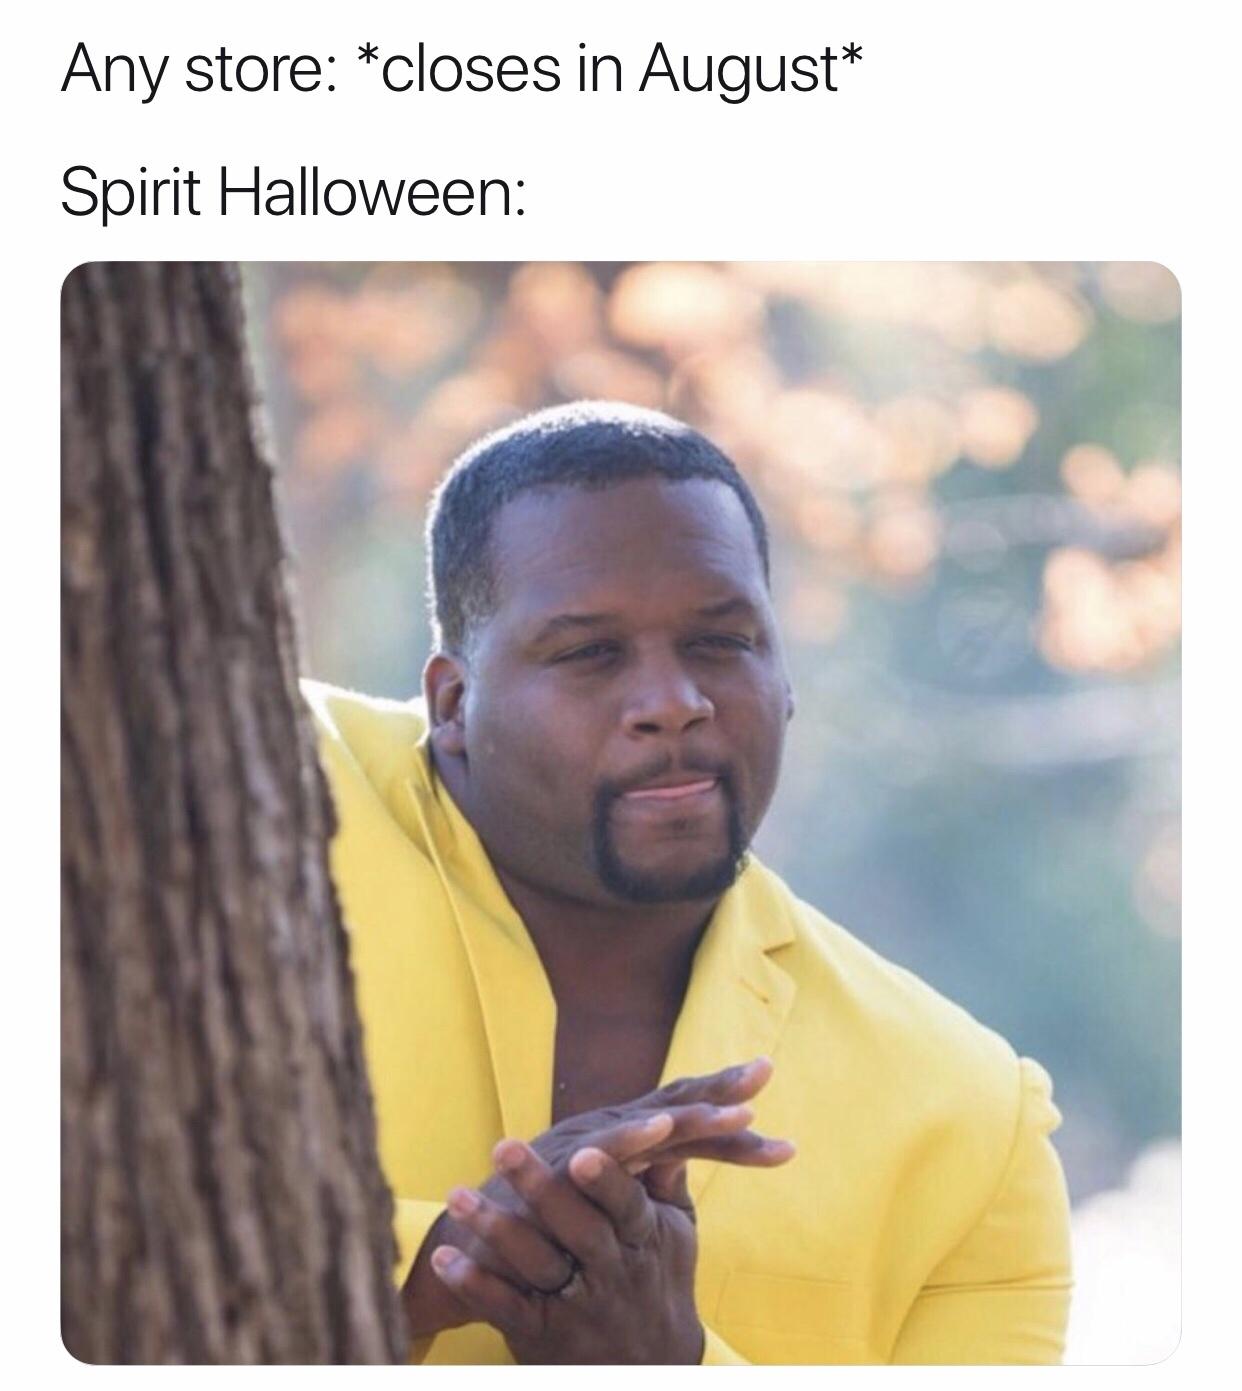 Spirit Halloween > any other store - meme